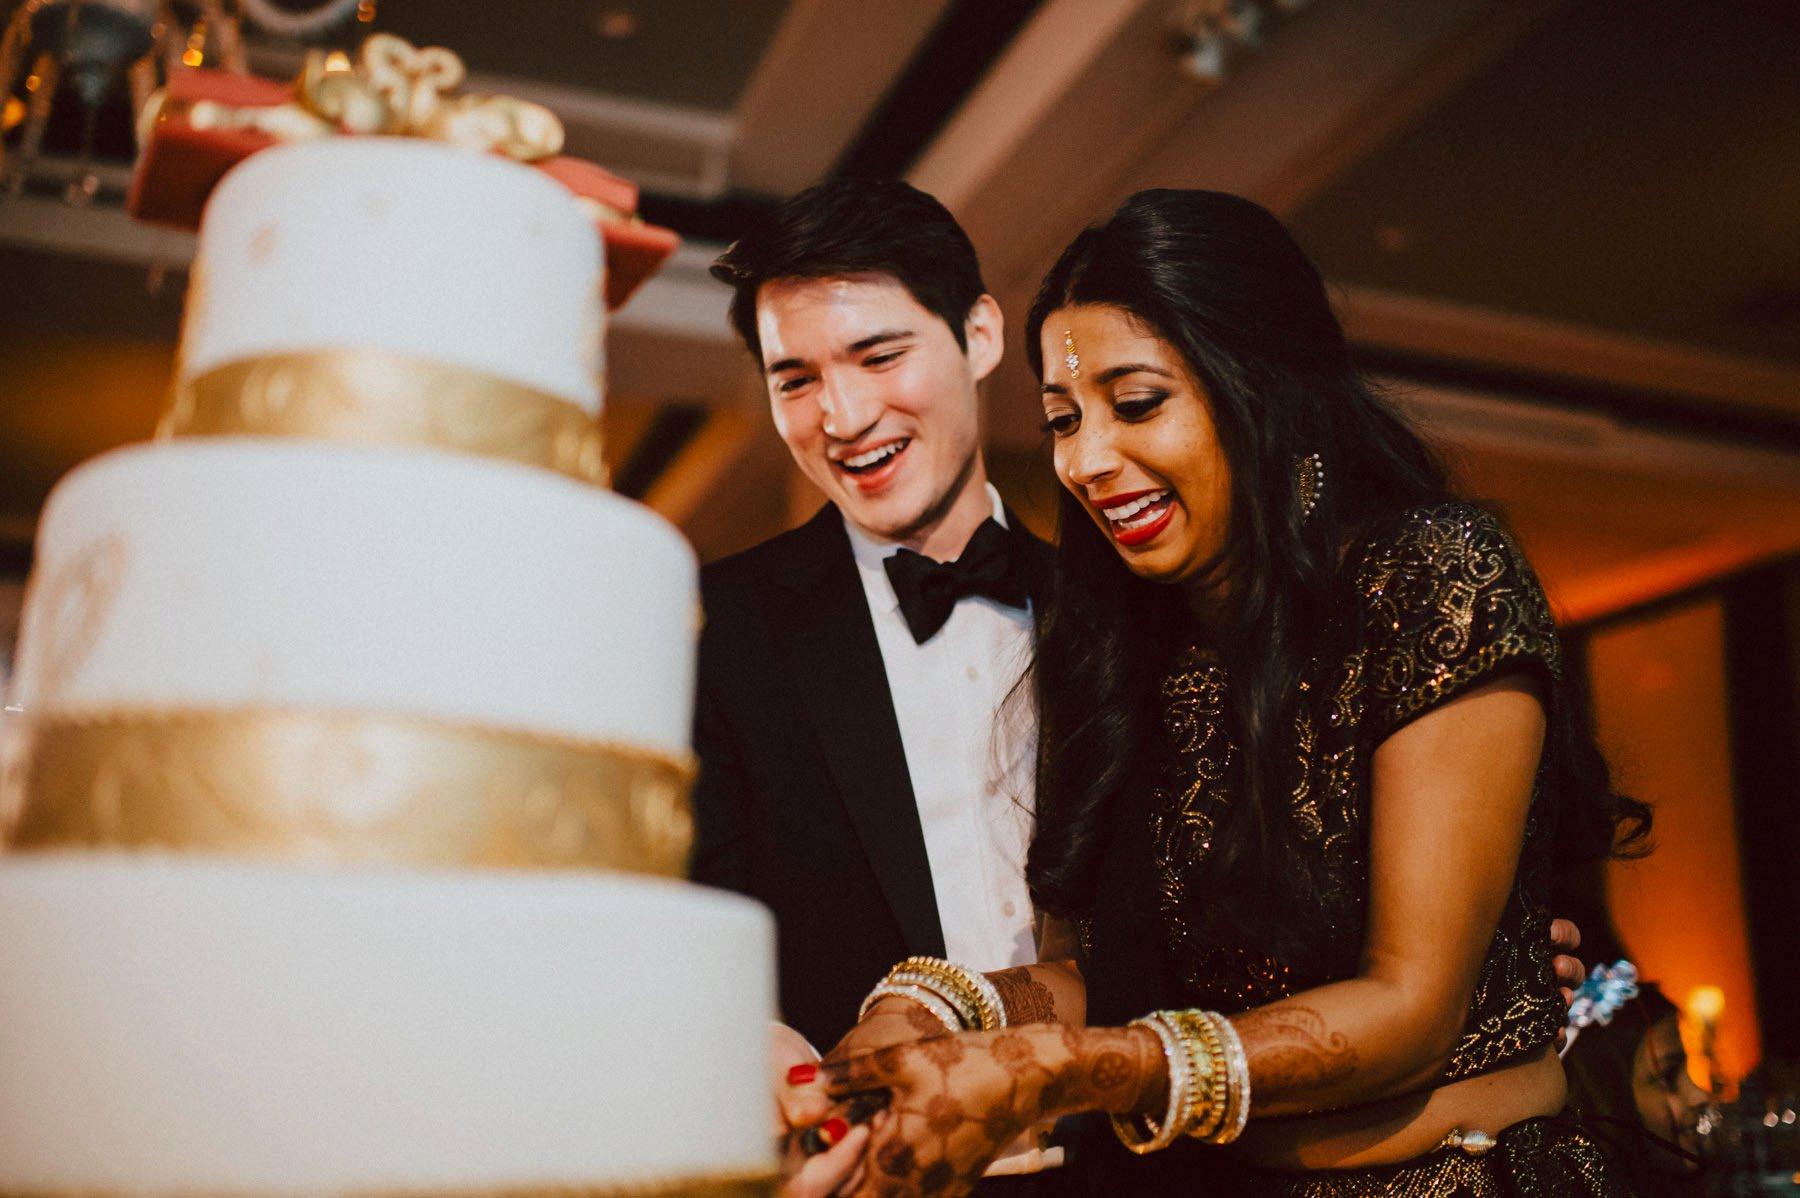 vie-philadelphia-indian-wedding-118.jpg